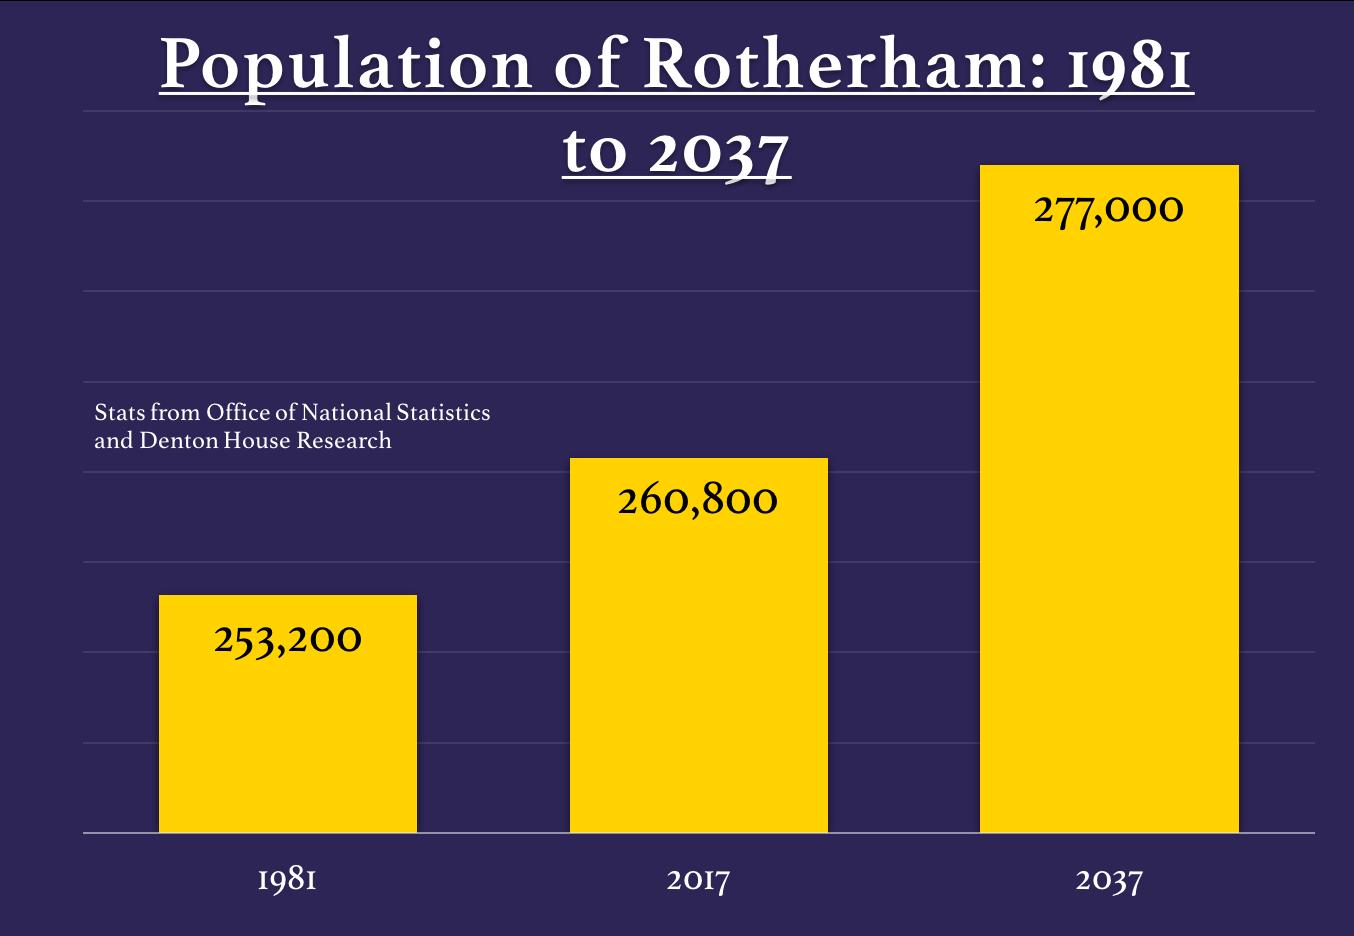 Population-Rotherham-1981-2037